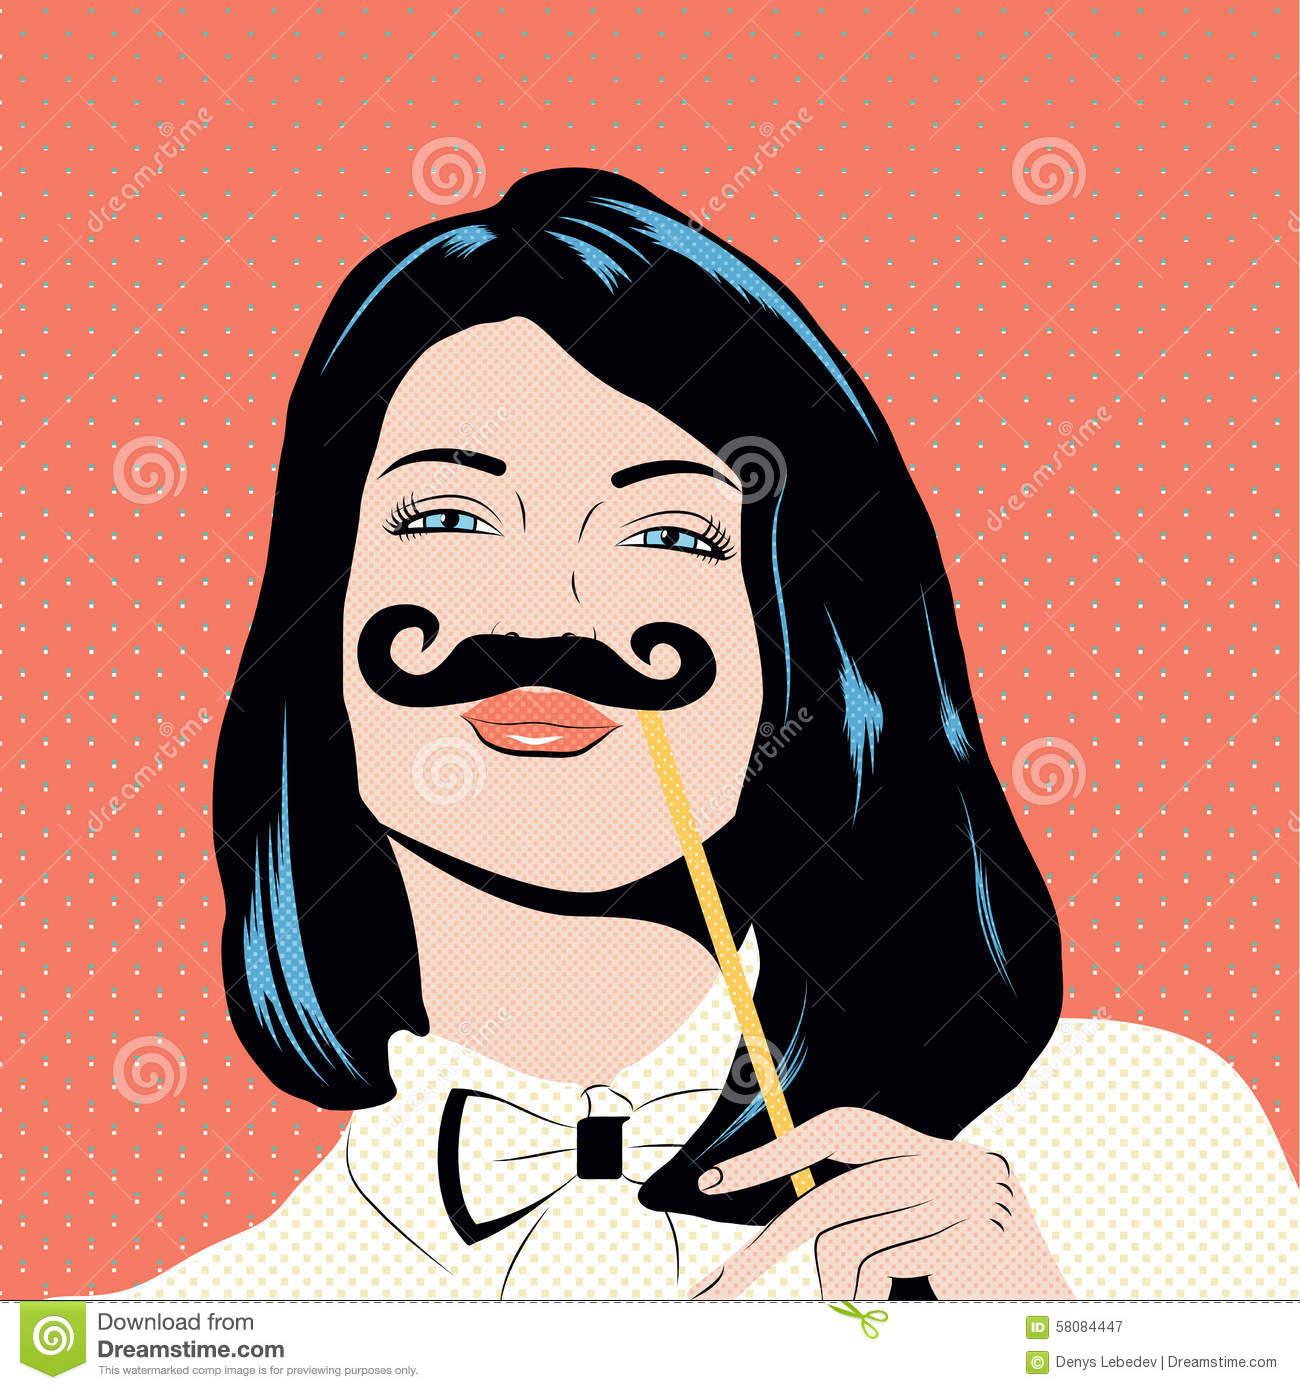 Pop Art Illustration With Girl Holding Mustache Mask. Stock.